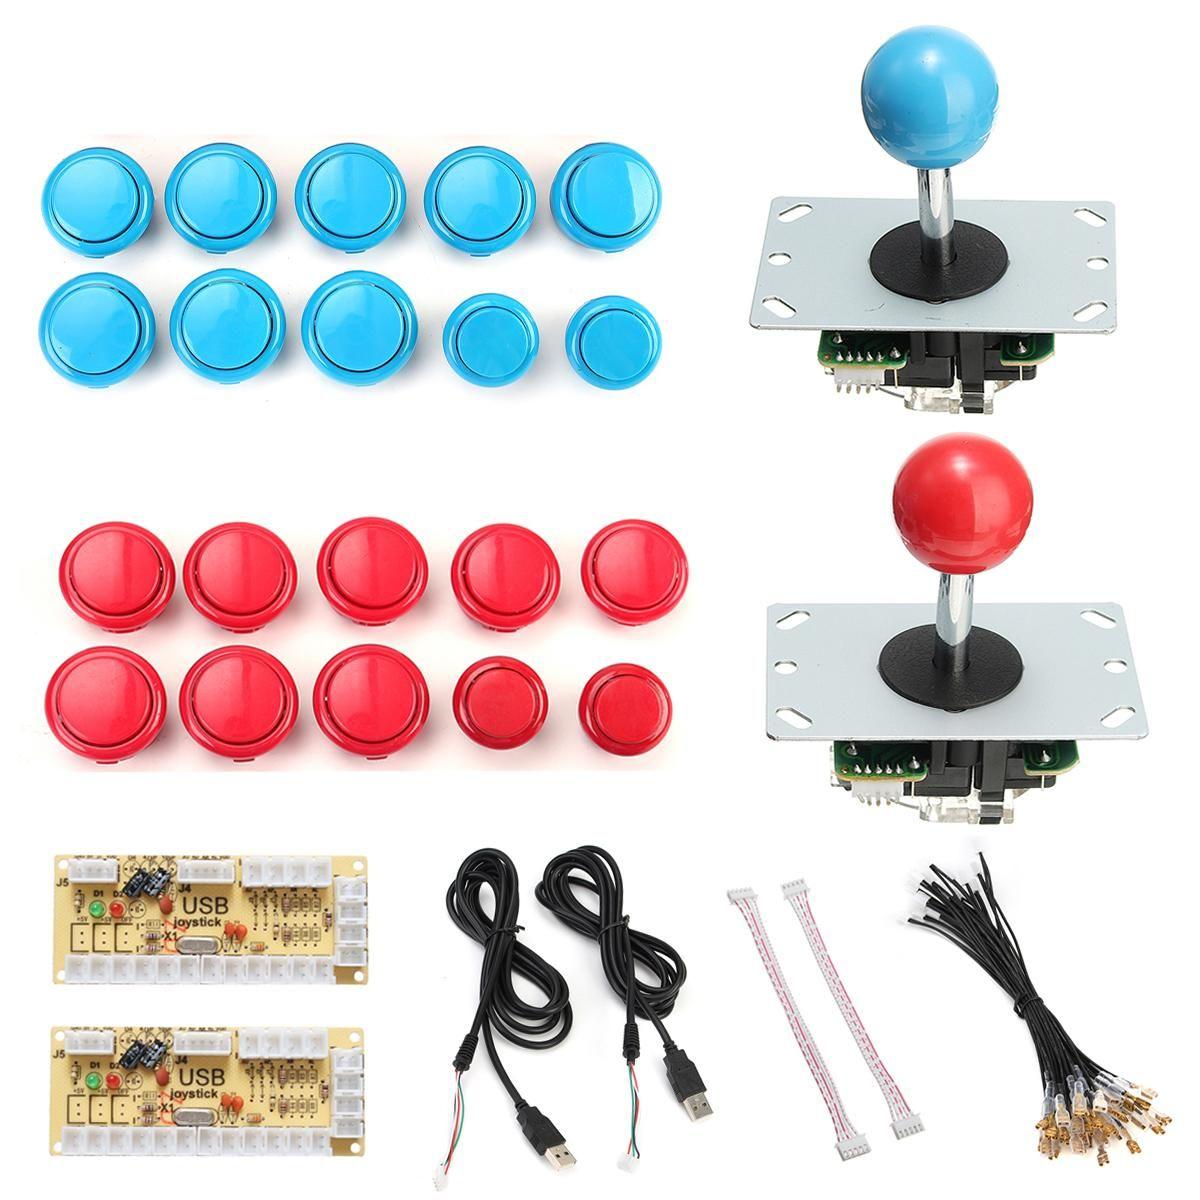 Blue Red Arcade Game DIY Joystick Kits With 20x Push Buttons + 2x Joysticks + 2x USB Encoder Board For Joystick Arcade Game Kits